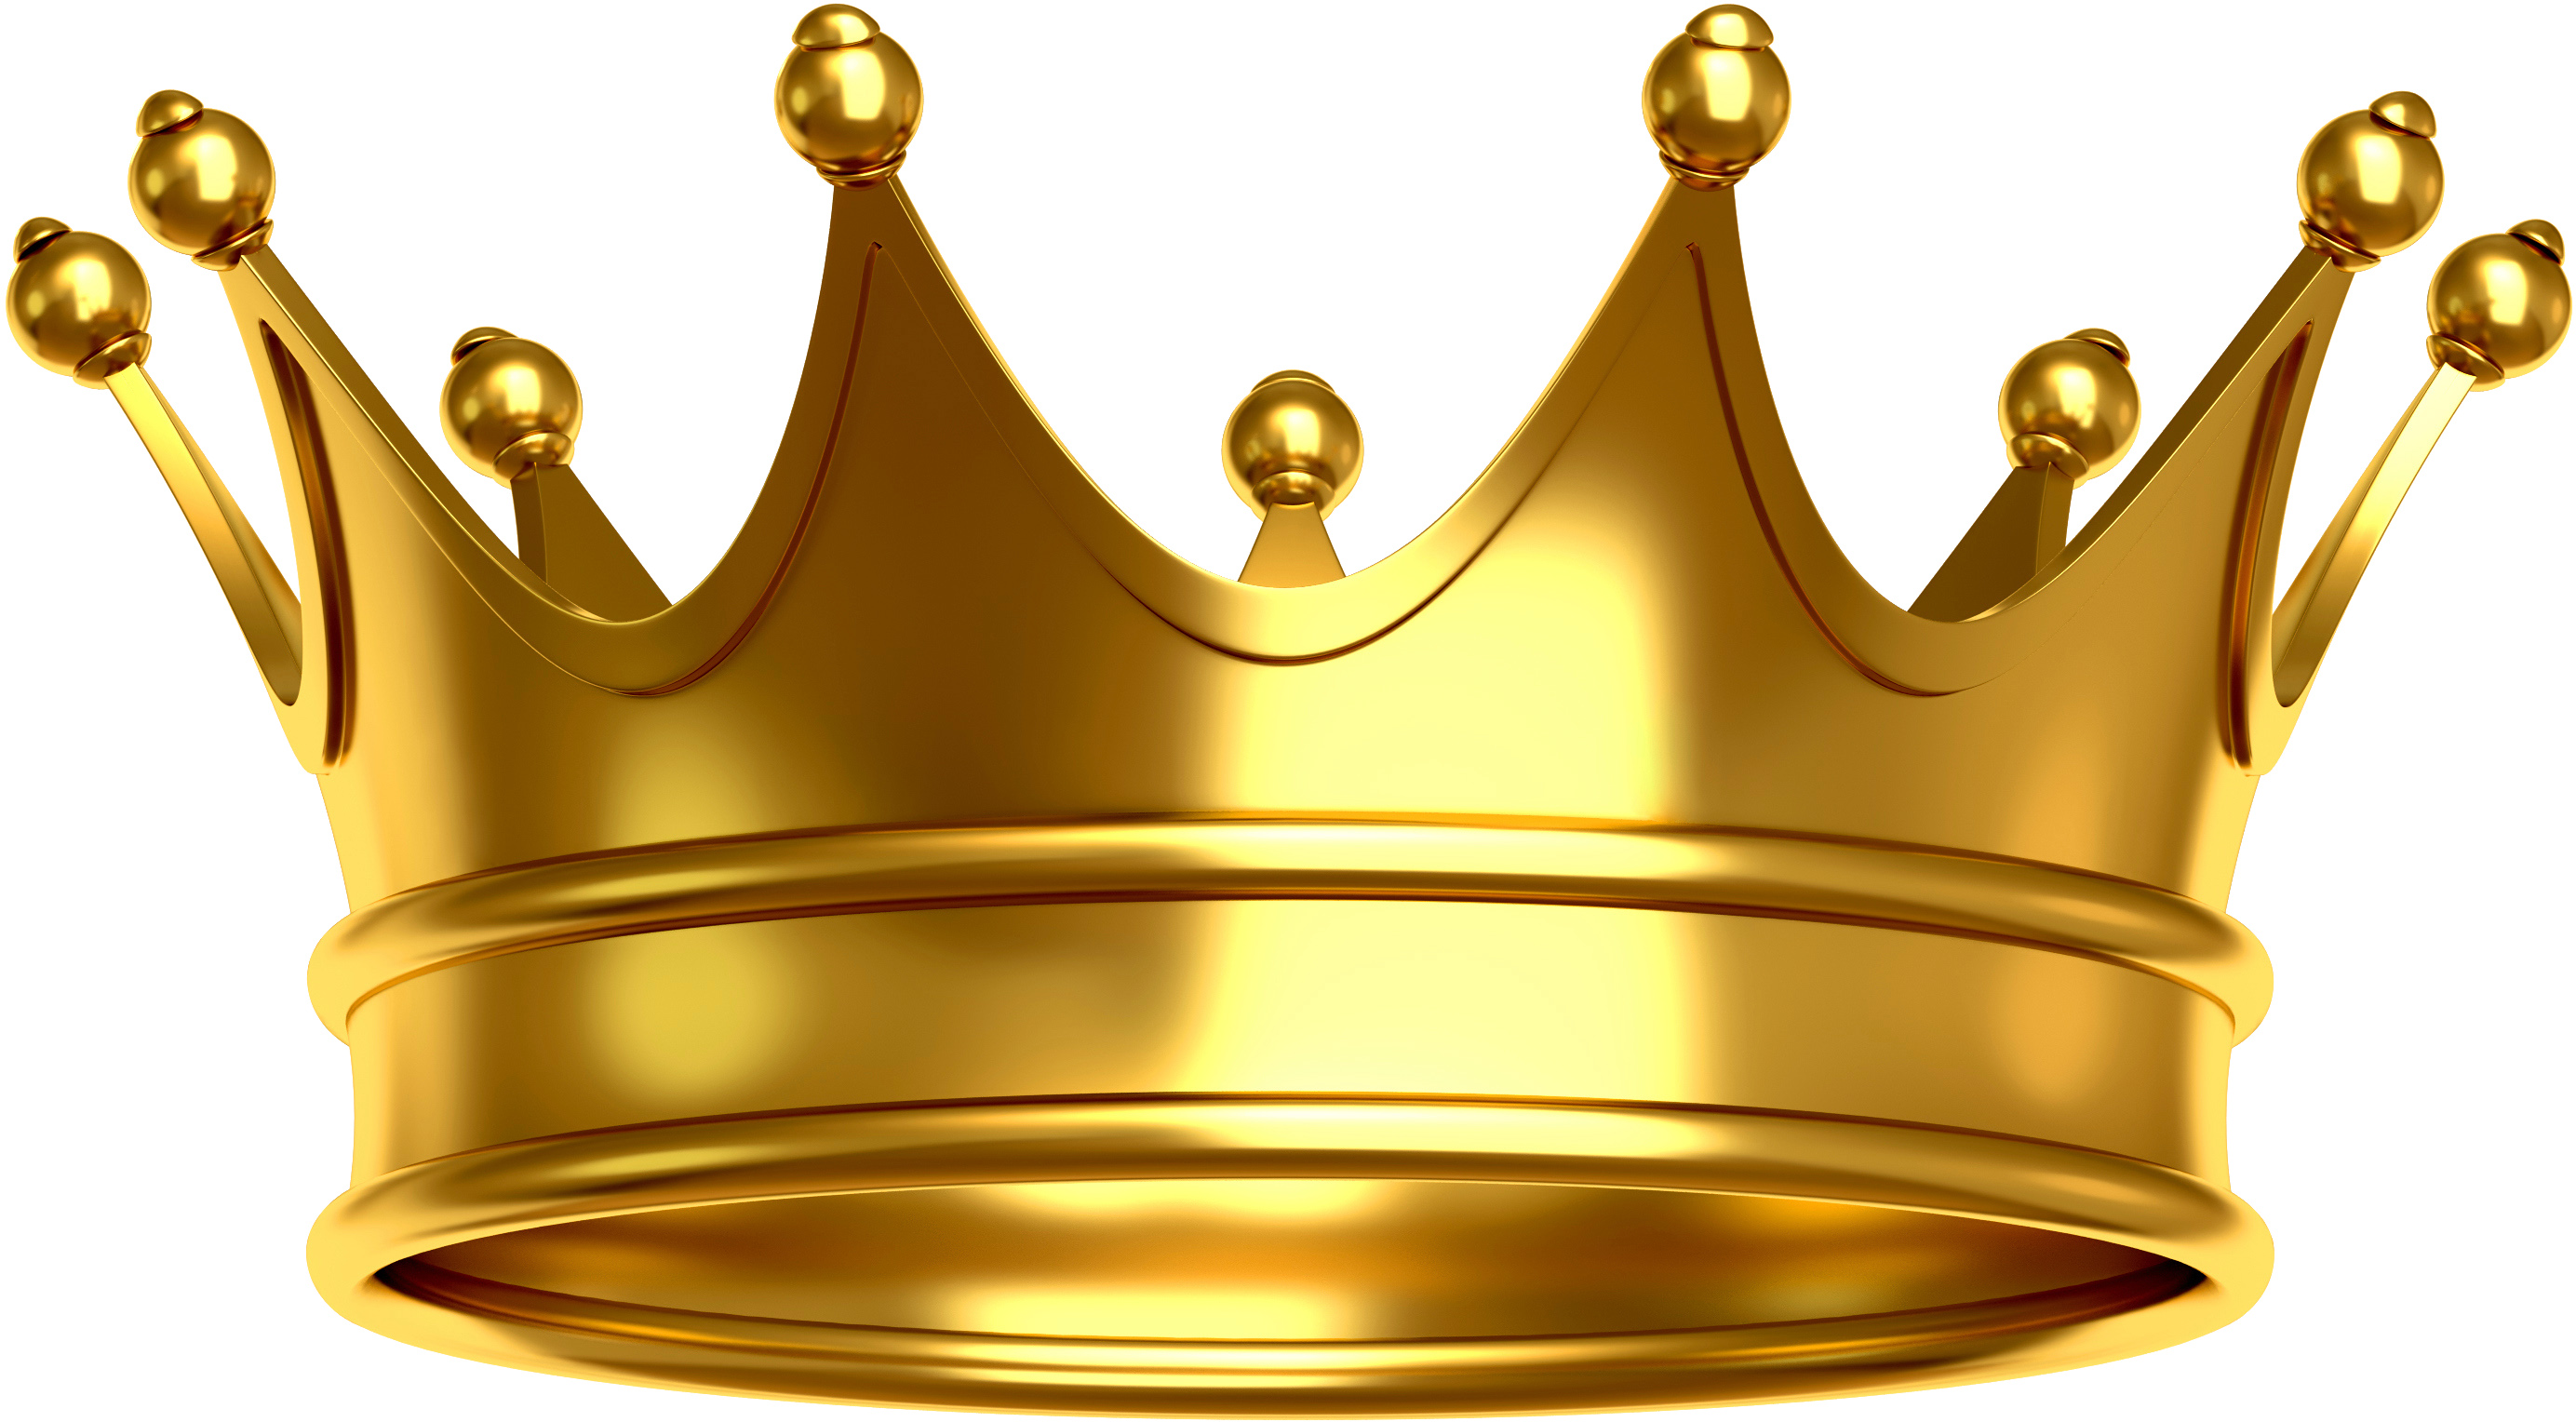 King crown clip art blue - photo#24